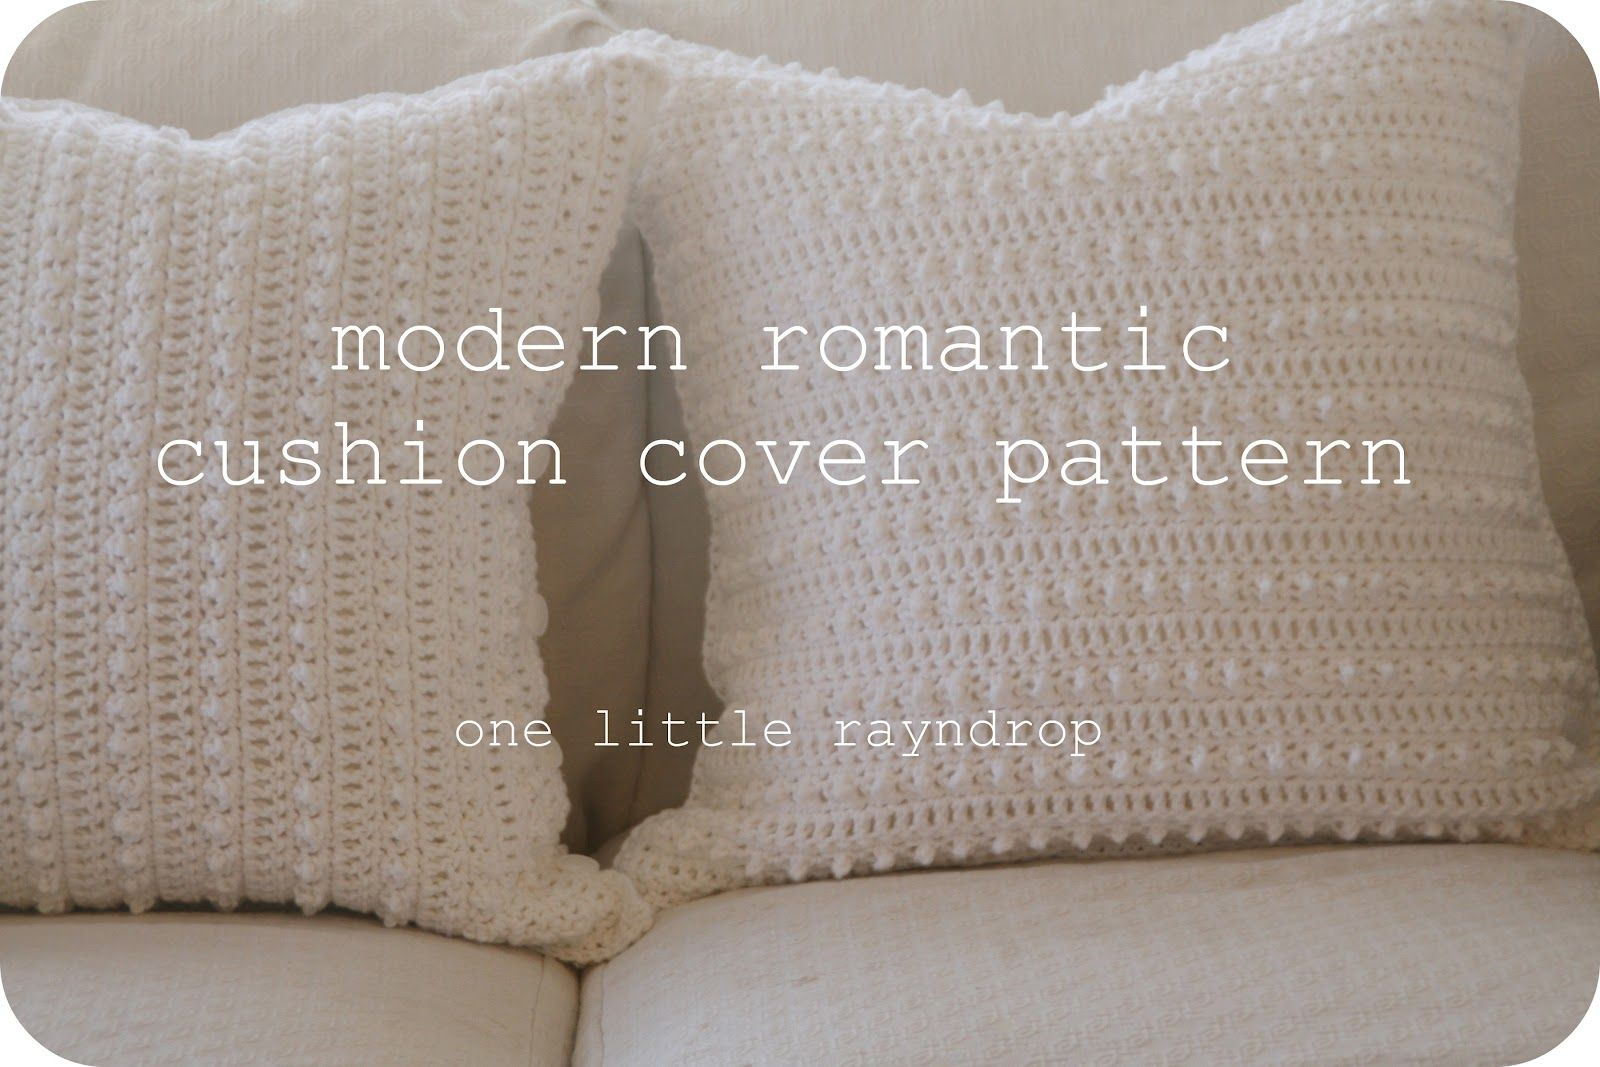 One little rayndrop modern romantic cushion cover pattern one little rayndrop modern romantic cushion cover pattern bankloansurffo Images